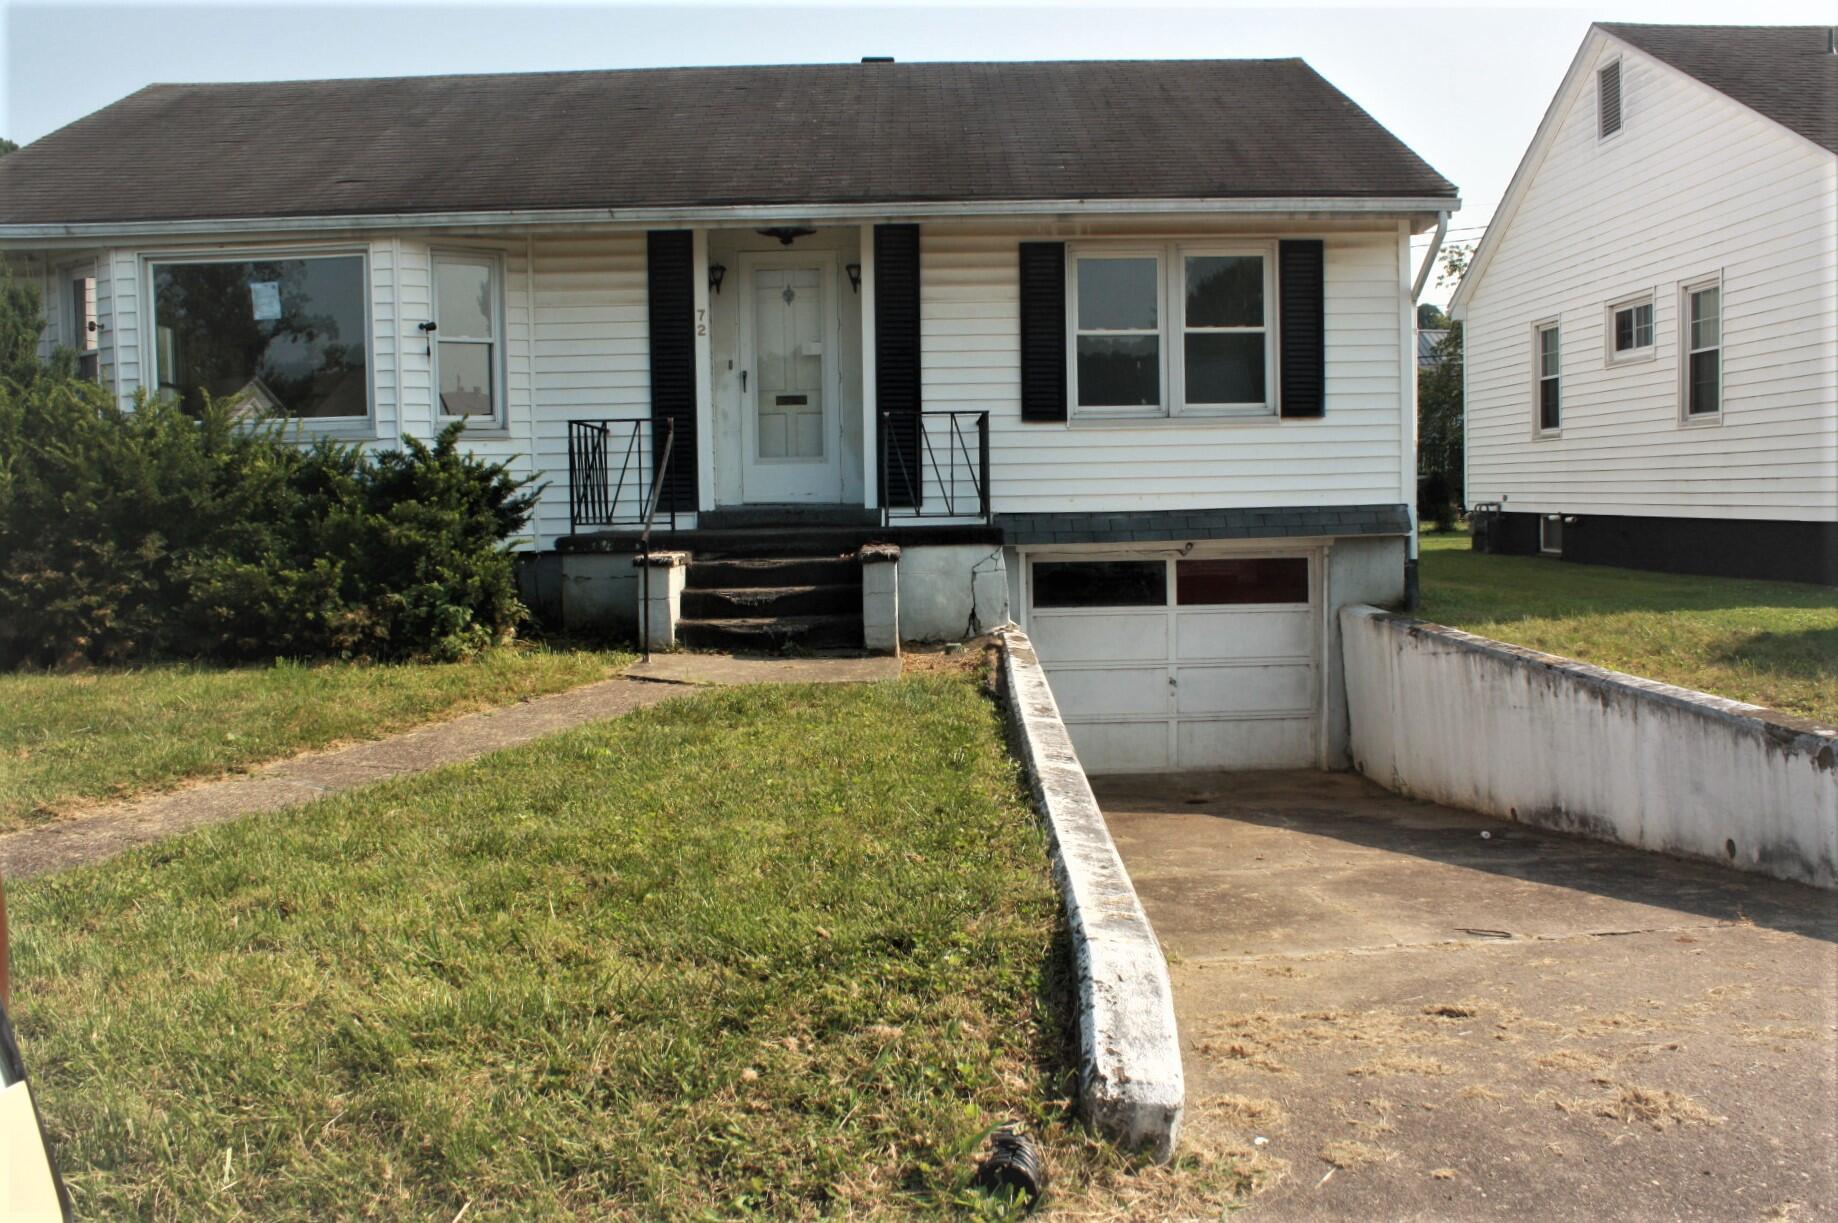 72 Ernst Avenue, Maysville, Kentucky 41056, 2 Bedrooms Bedrooms, ,1 BathroomBathrooms,Residential,For Sale,Ernst,20120284